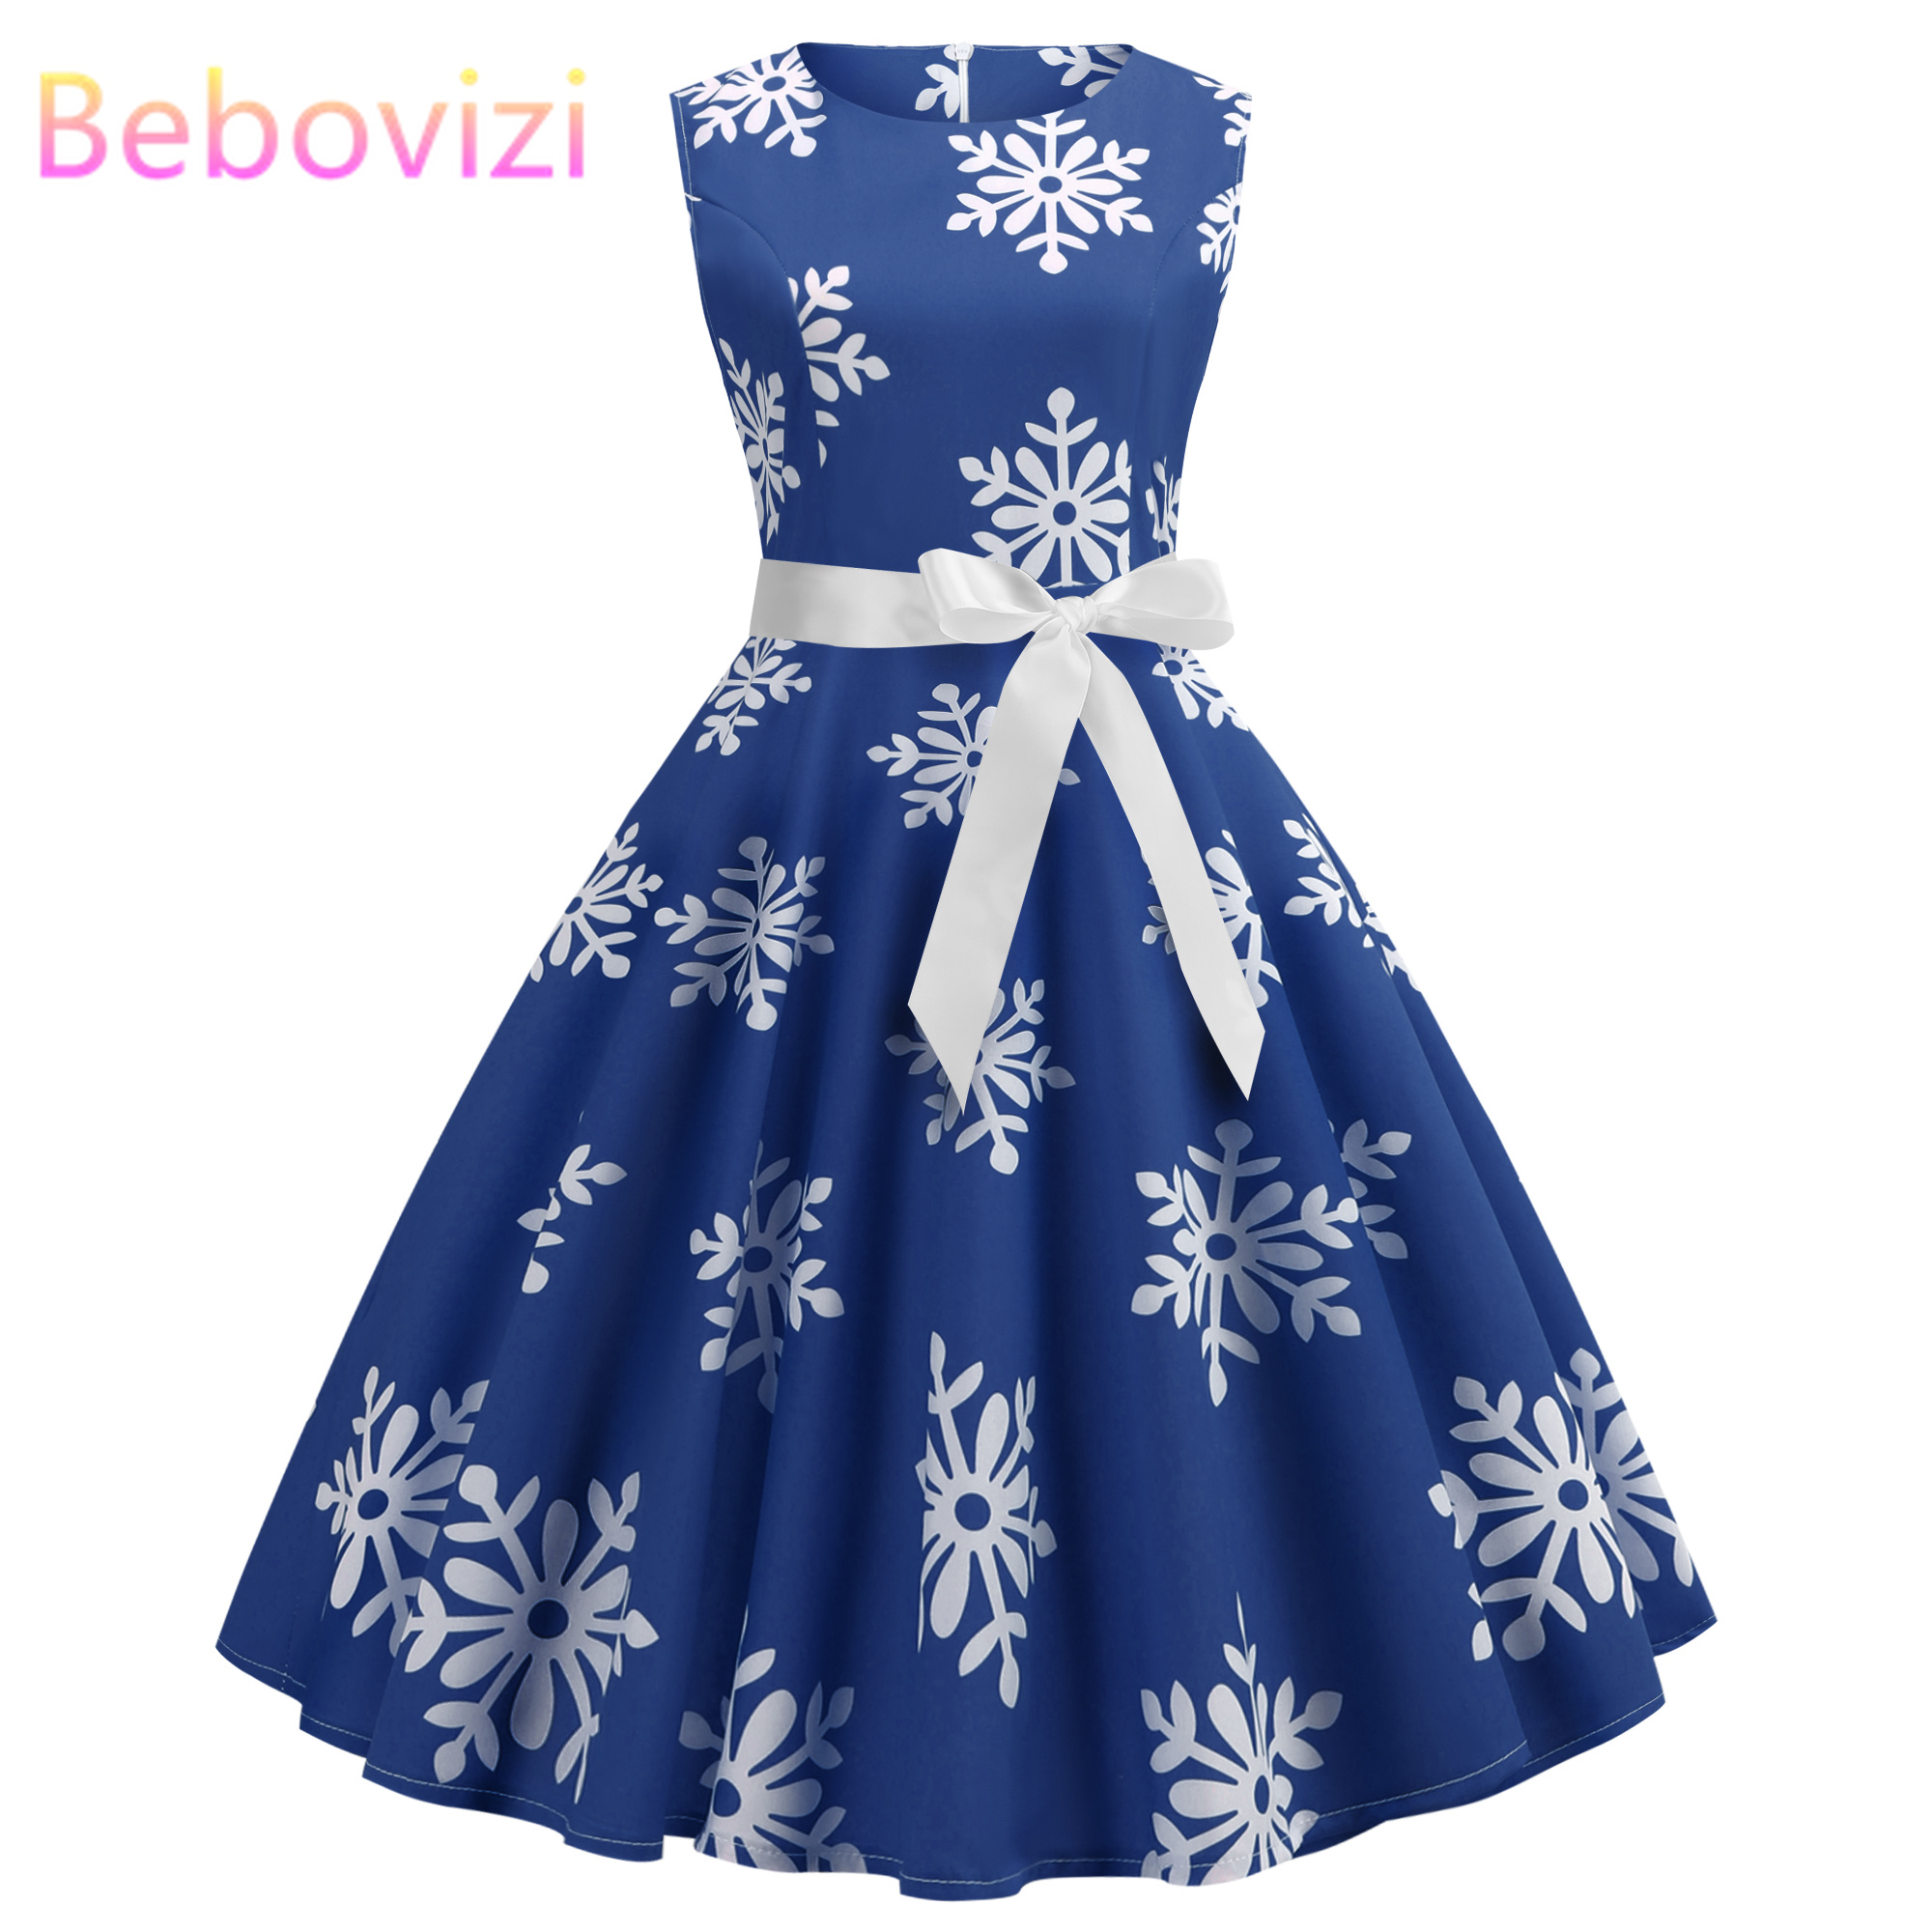 ff5ed6b66e Blue Women Dress 2019 Christmas Casual Snowflake Pinup Vestidos Party  Dresses Retro Vintage 50s 60s Robe Femme Rockabilly Swing